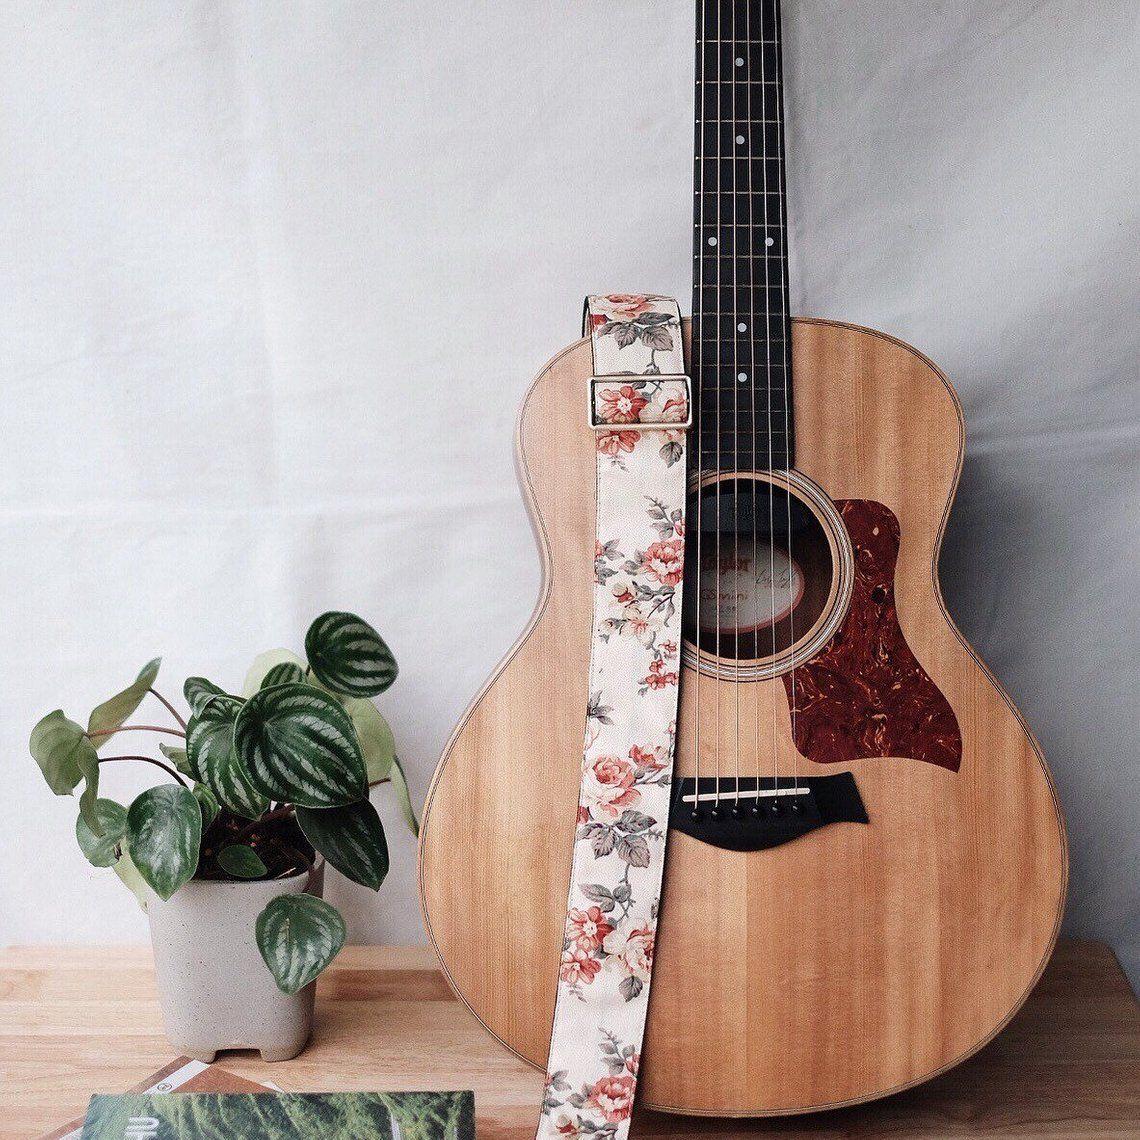 Cream Fabric Flower Guitar Strap | Etsy